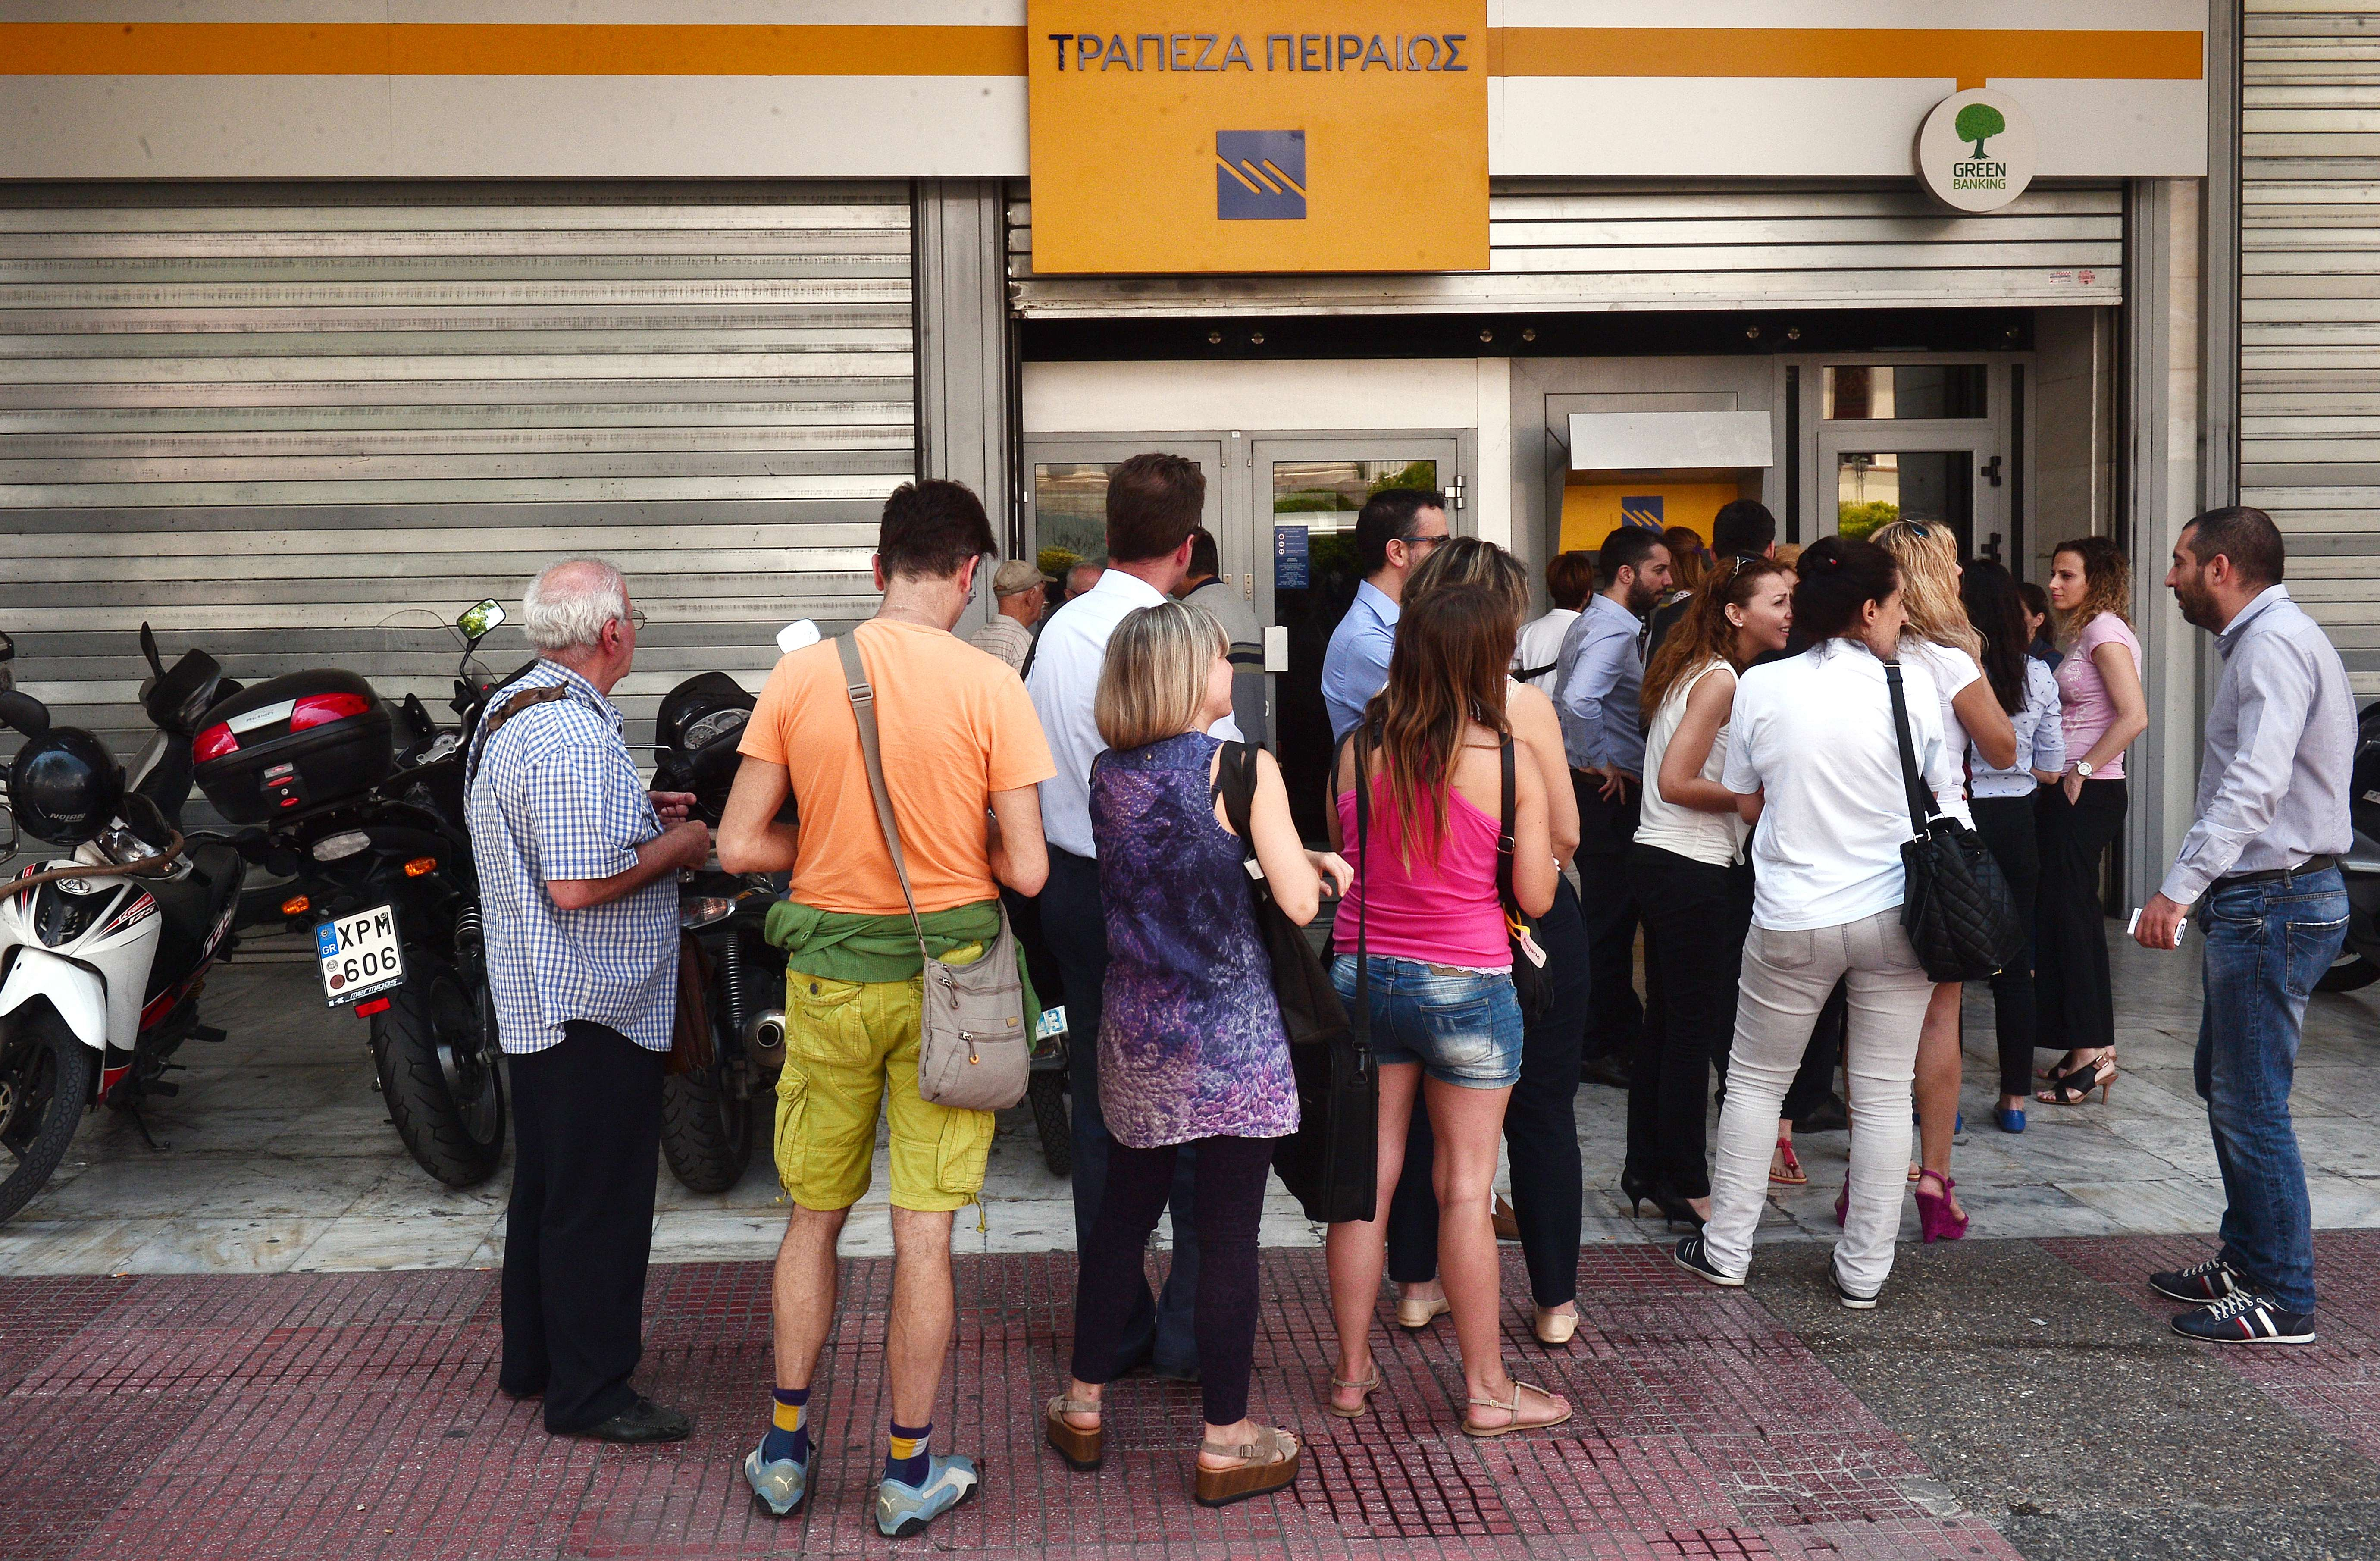 GREECE-ECONOMY-POLITICS-EU-IMF